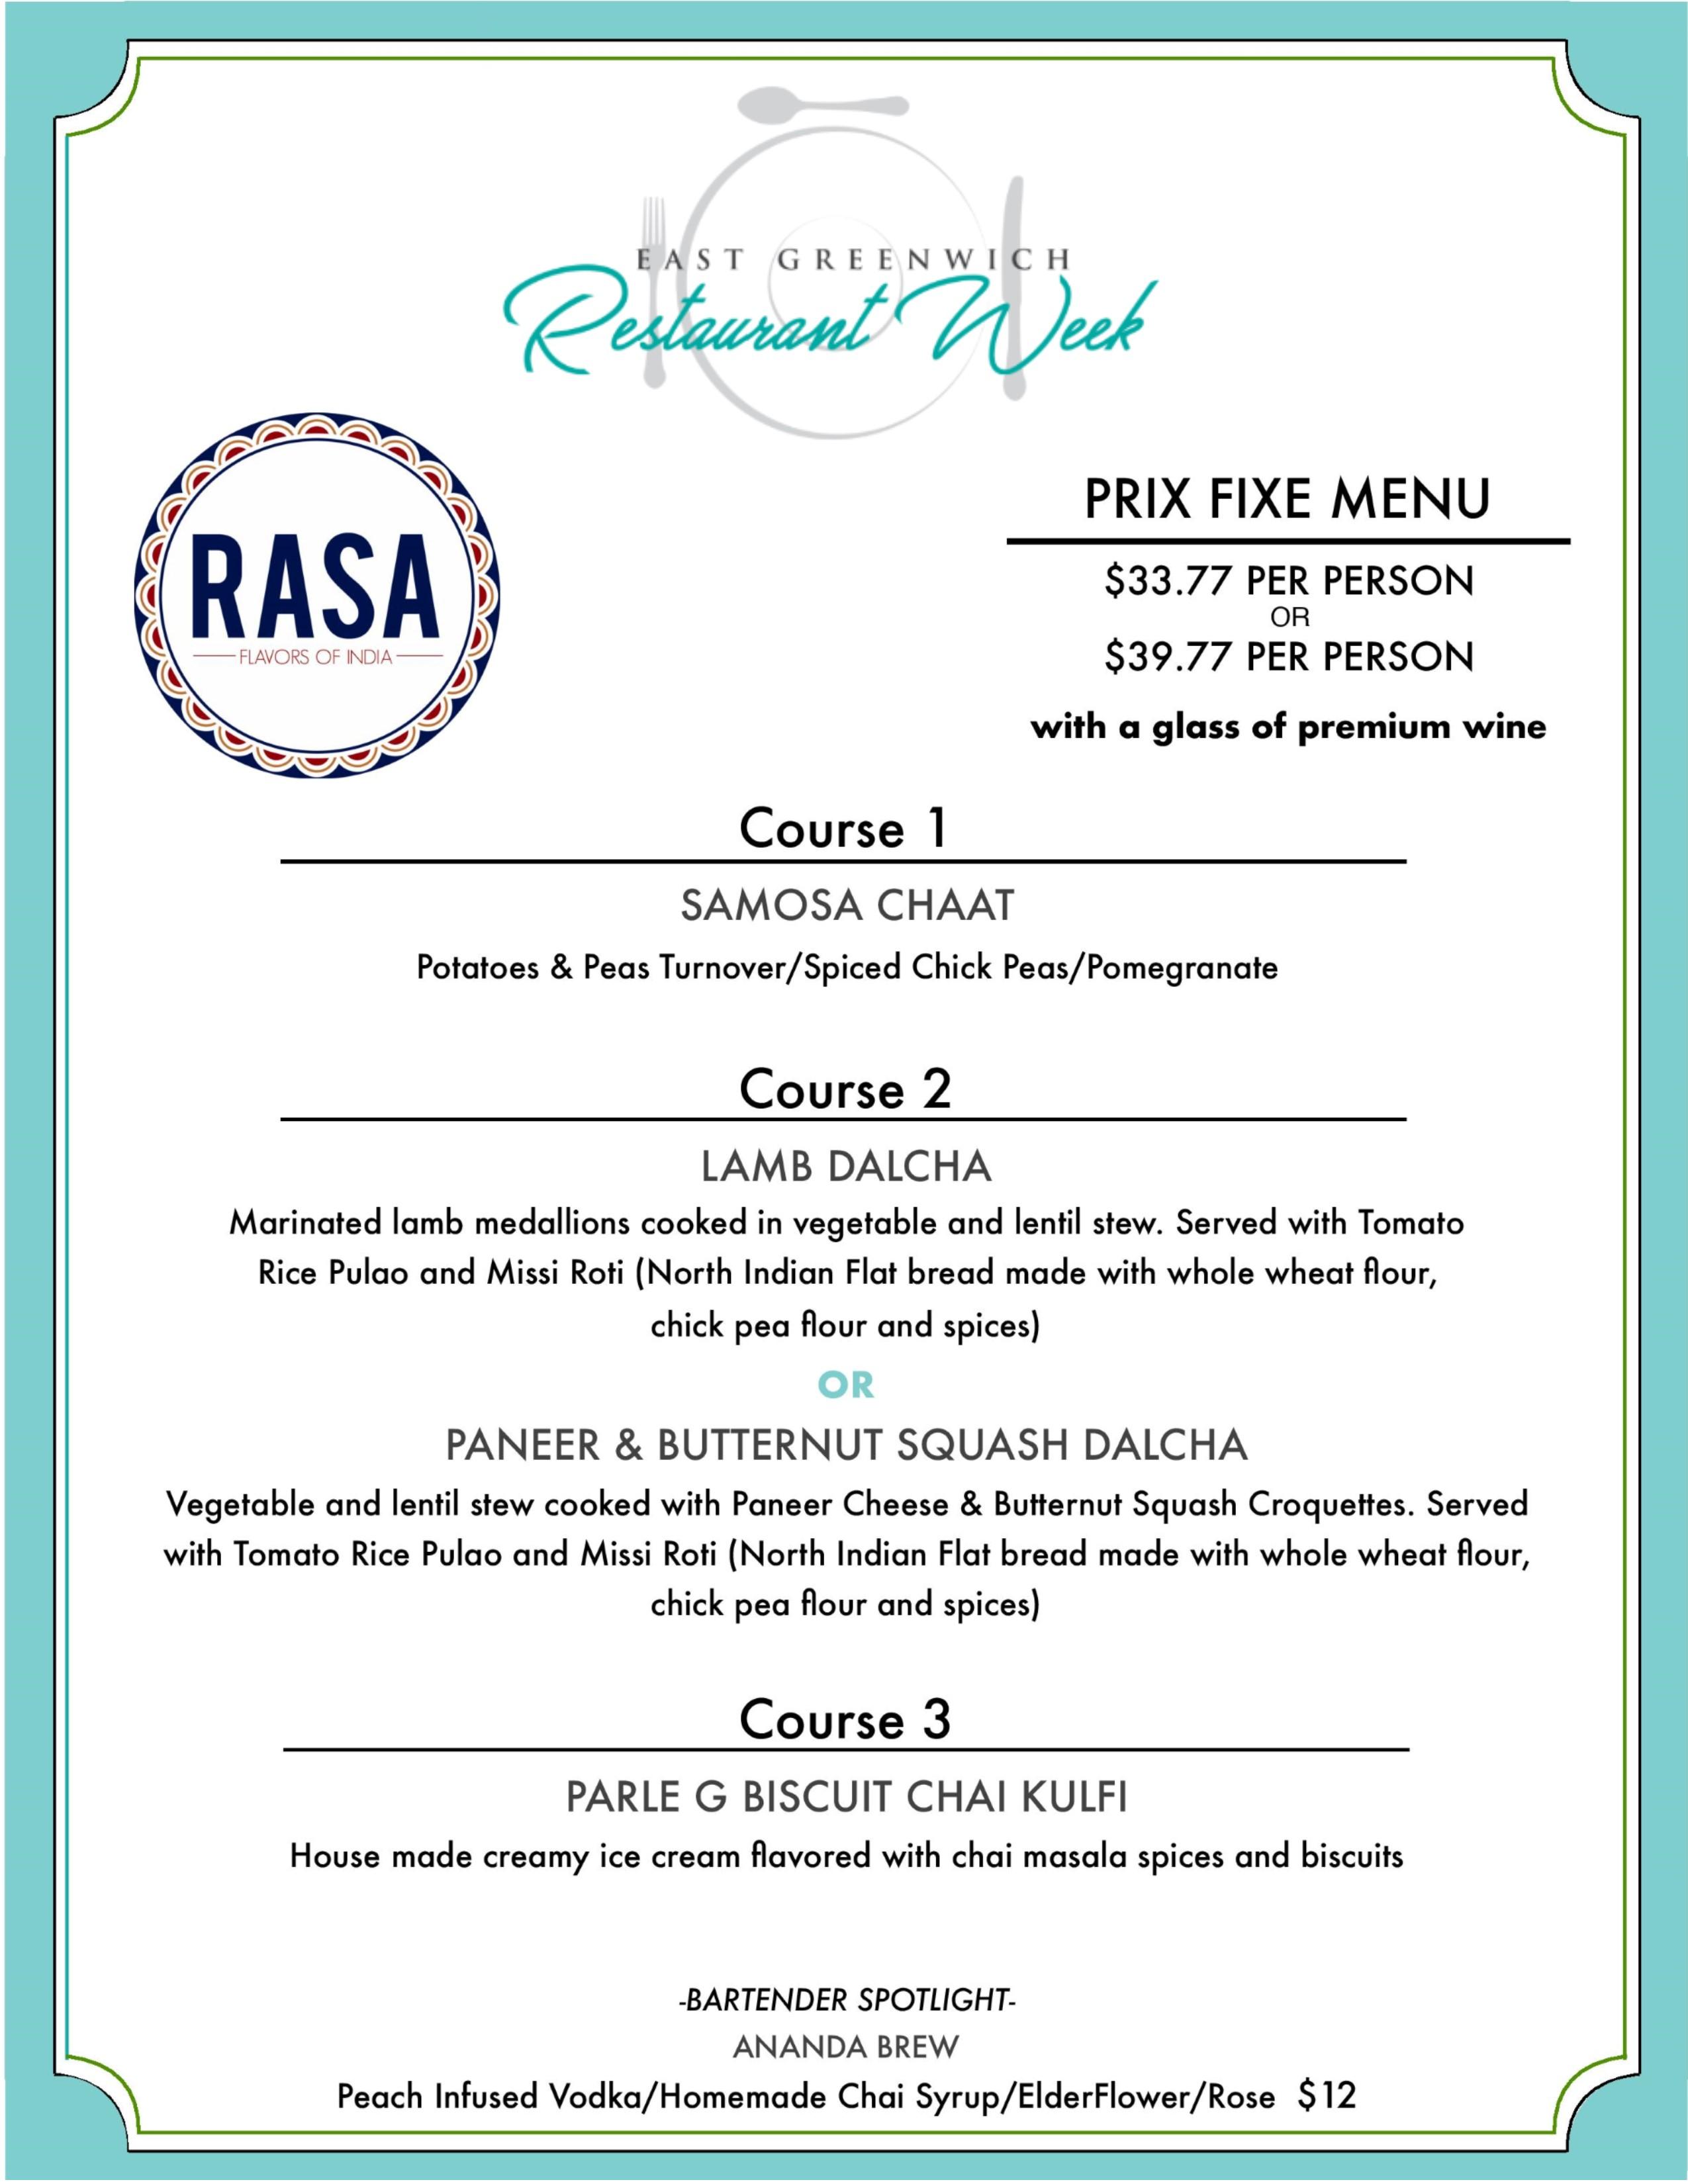 east greenwich restaurant week